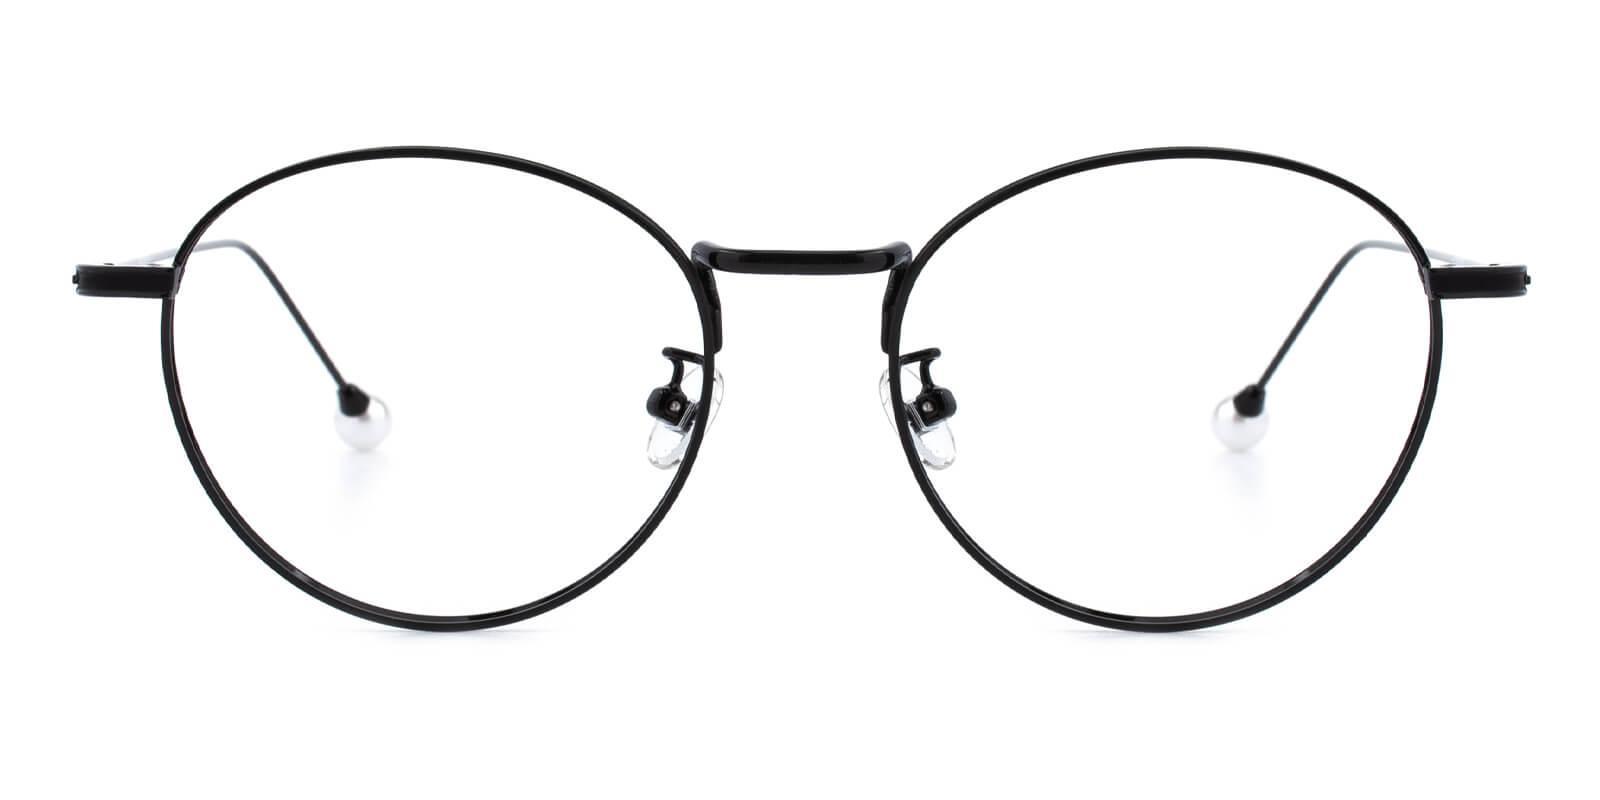 Frail-Black-Round-Metal-Eyeglasses-additional2